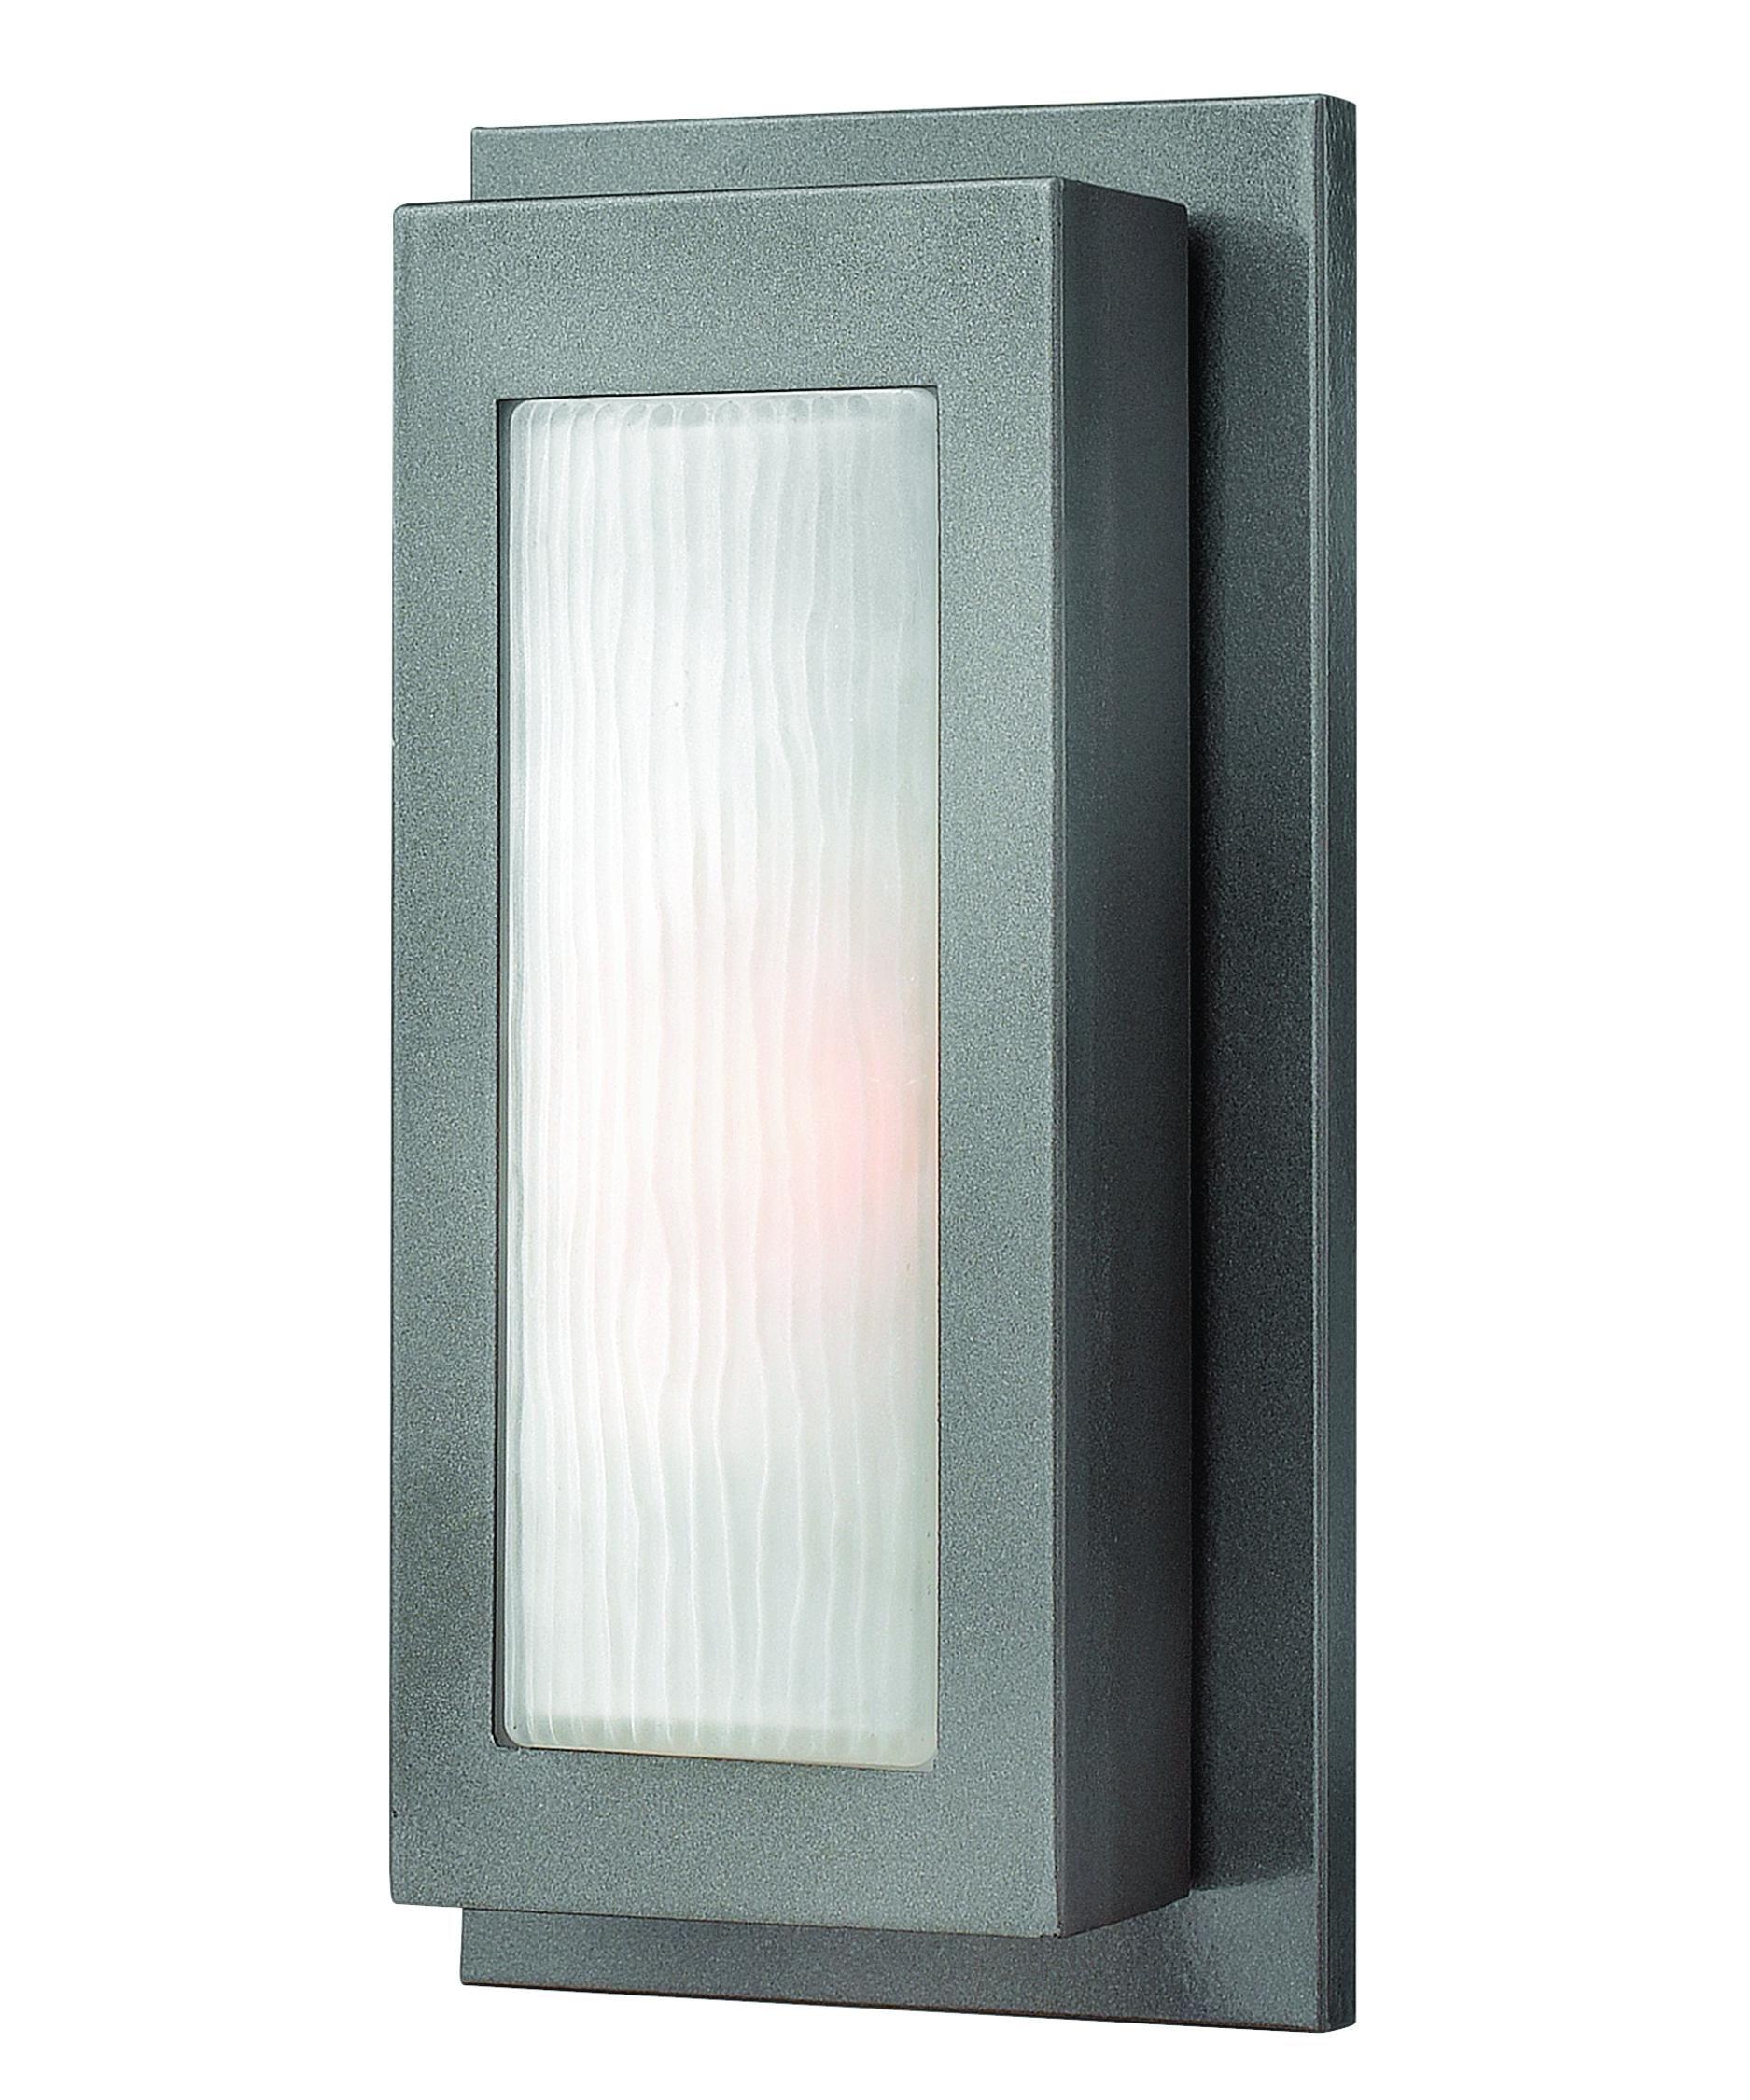 Hinkley lighting titan inch wide light outdoor wall light